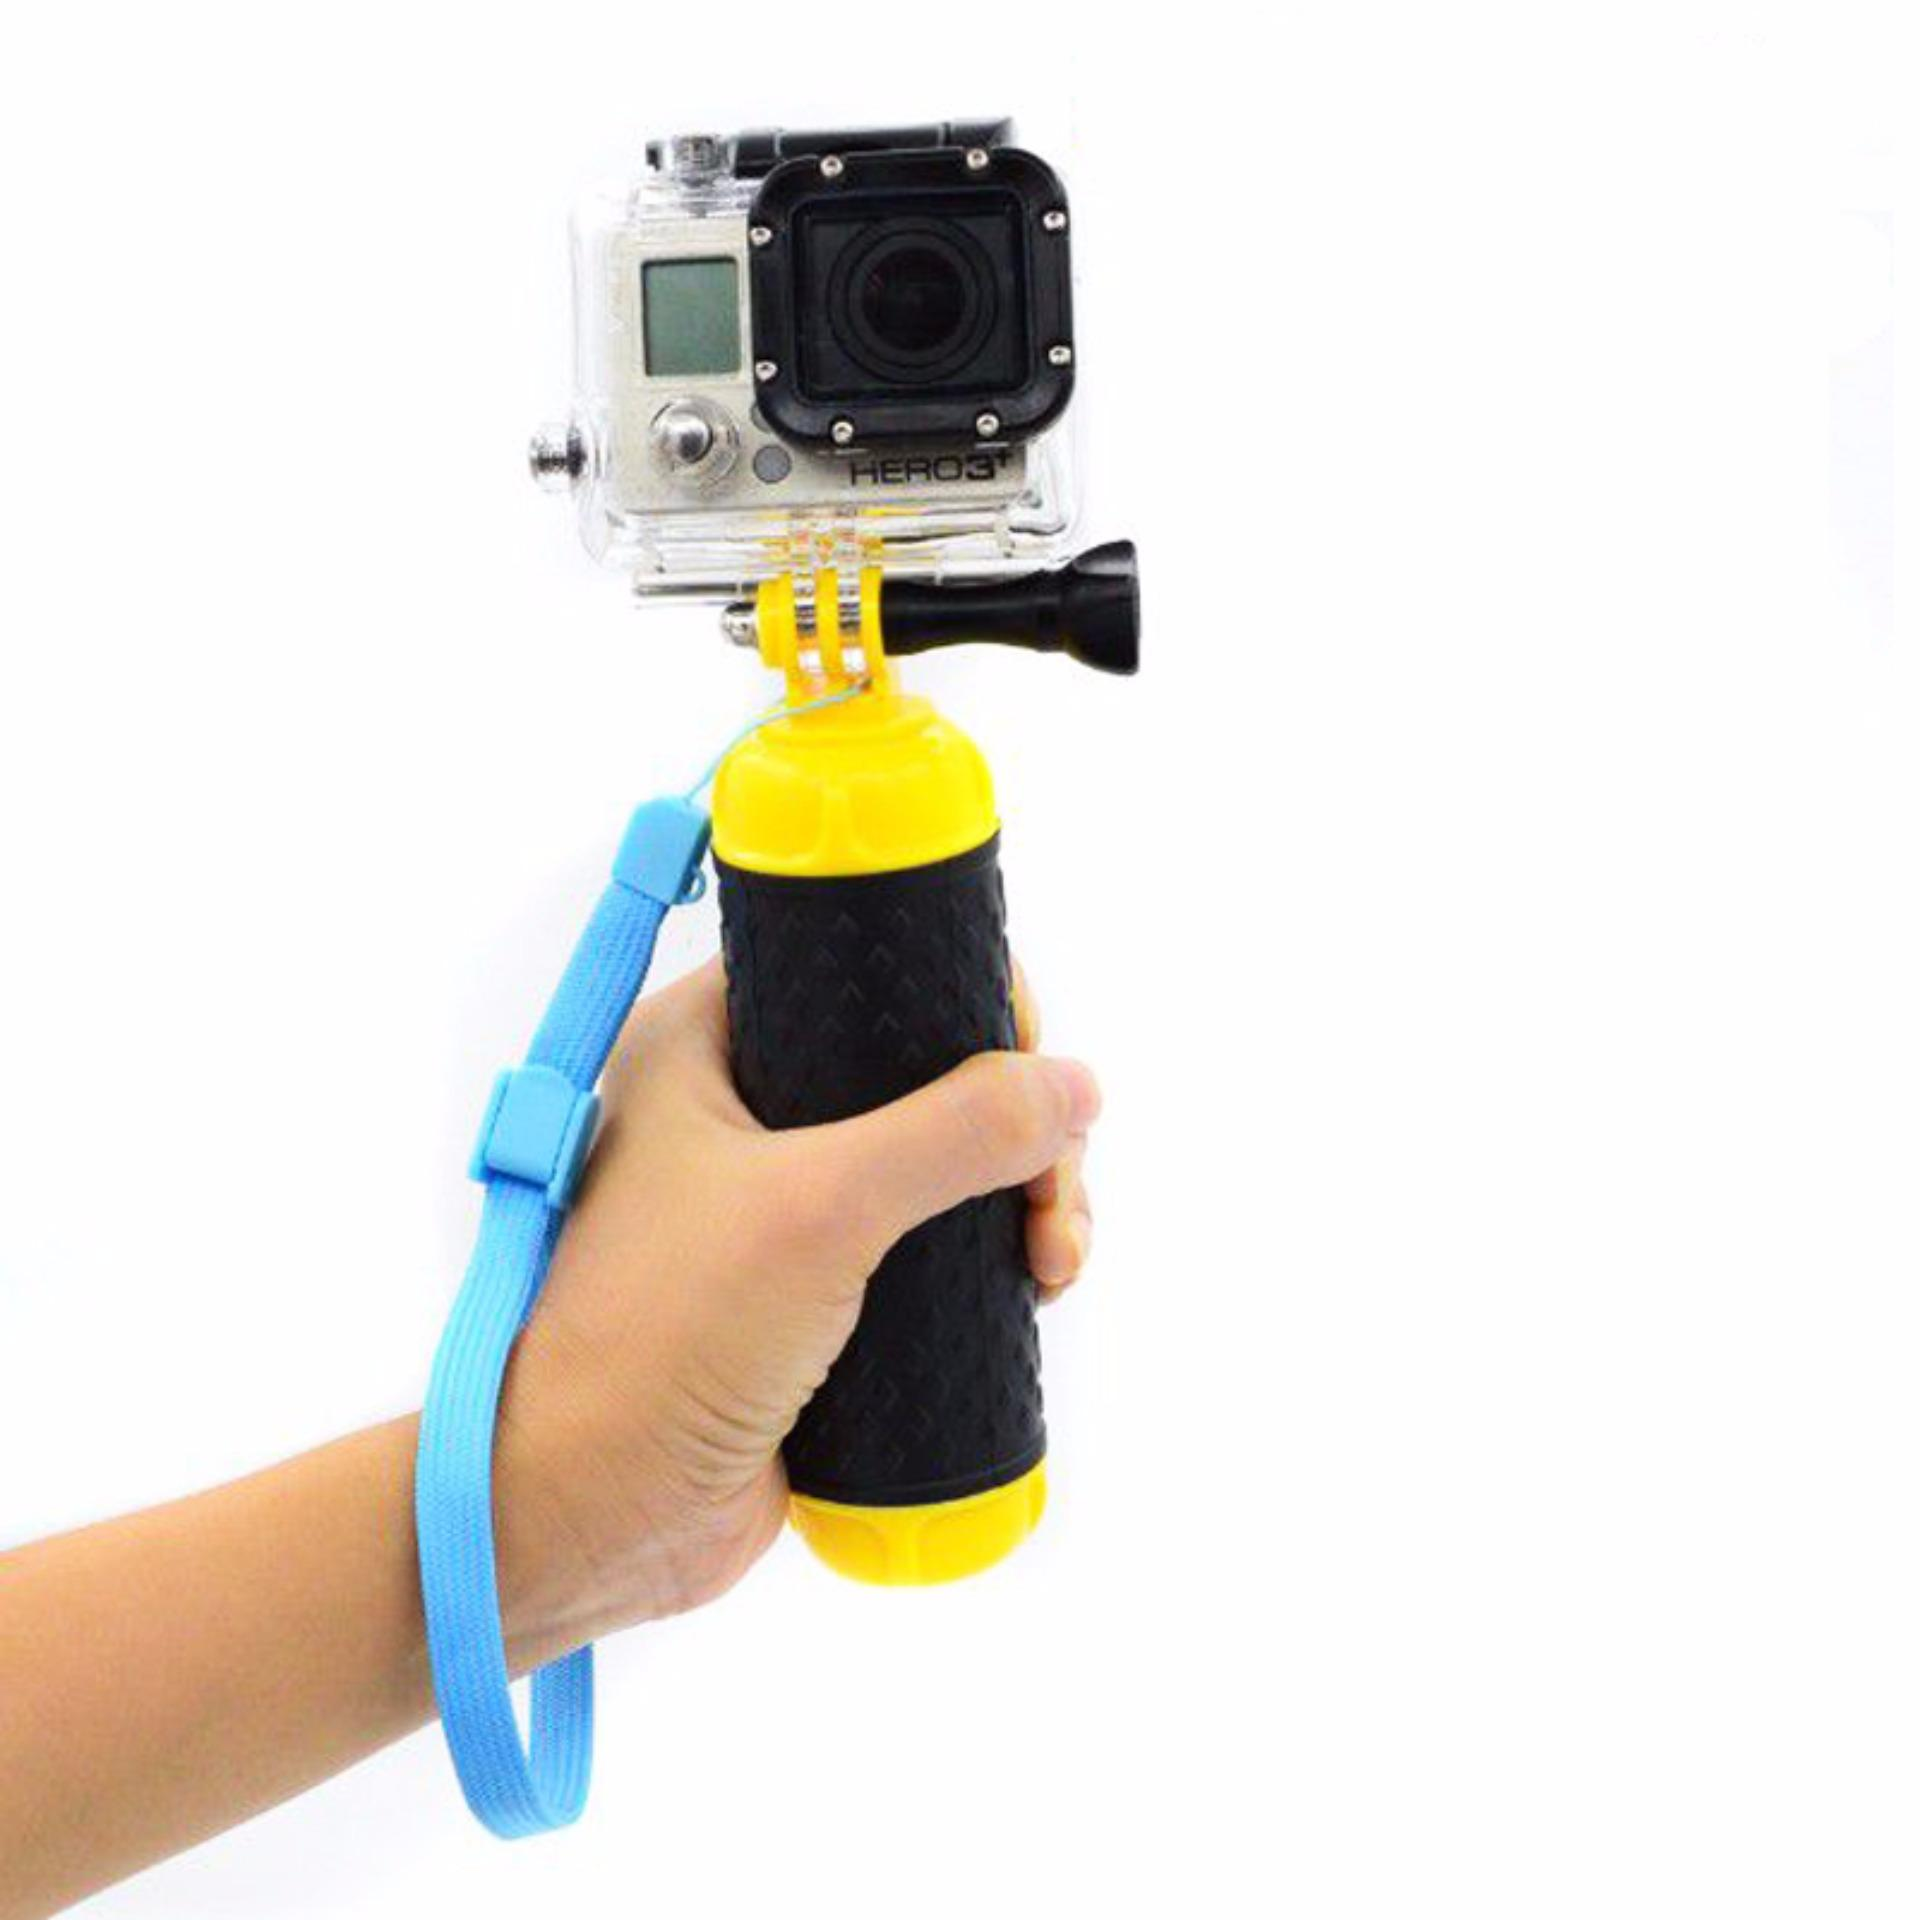 Float Tangan Grip Daya Apung Rod Pole Stick Monopod Tripod untuk Gopro5 SJCAM Pergi Pro 5 4 3 Action Sport Camera Aksesoris